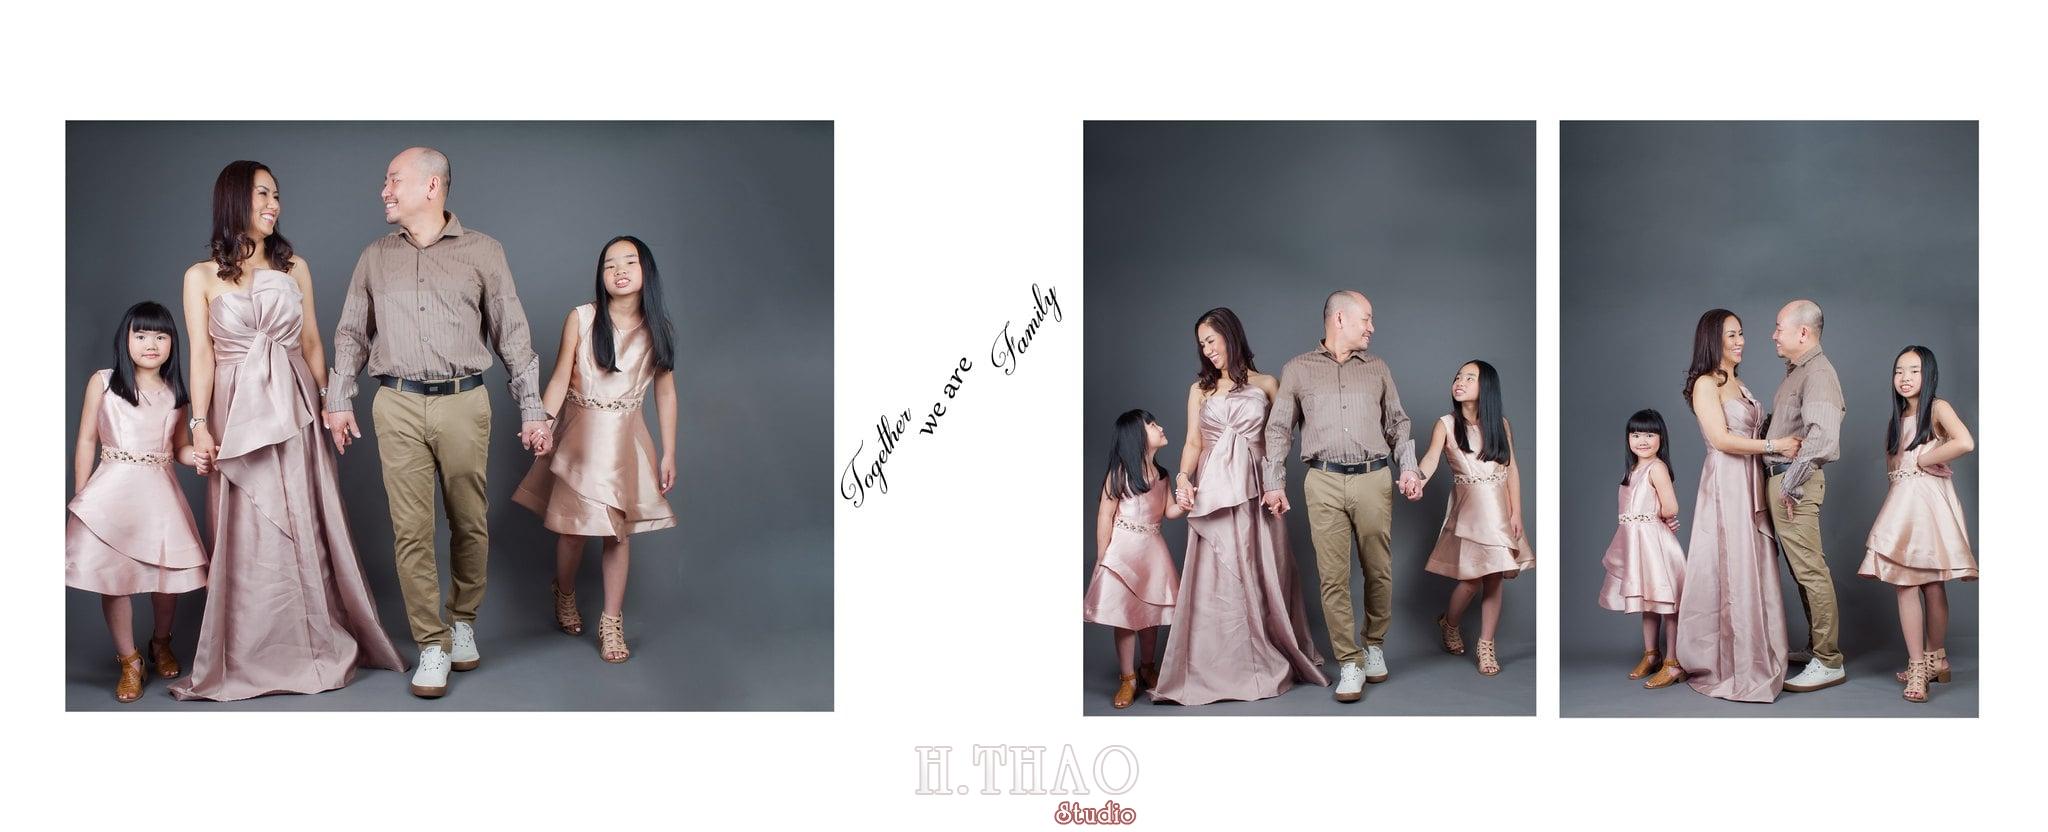 Anh gia dinh Jenny Nguyen 2 - Album ảnh gia đình chị Jenny Nguyễn - HThao Studio